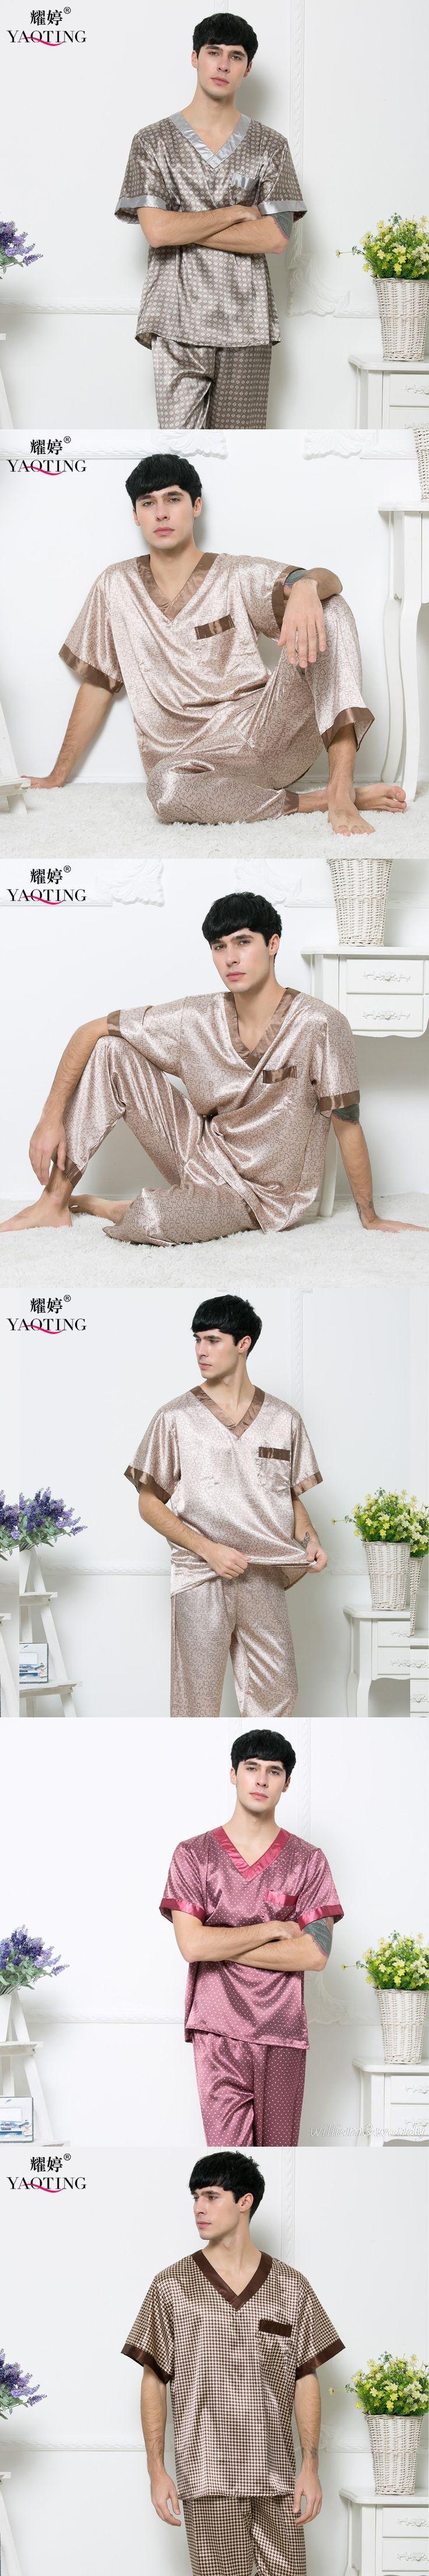 Men Elegant Retro Plus Size V-neck Homewear Summer Short Sleeve Summer Nightgown Imitation Silk Pajama Set Coffee Silky Bathrobe